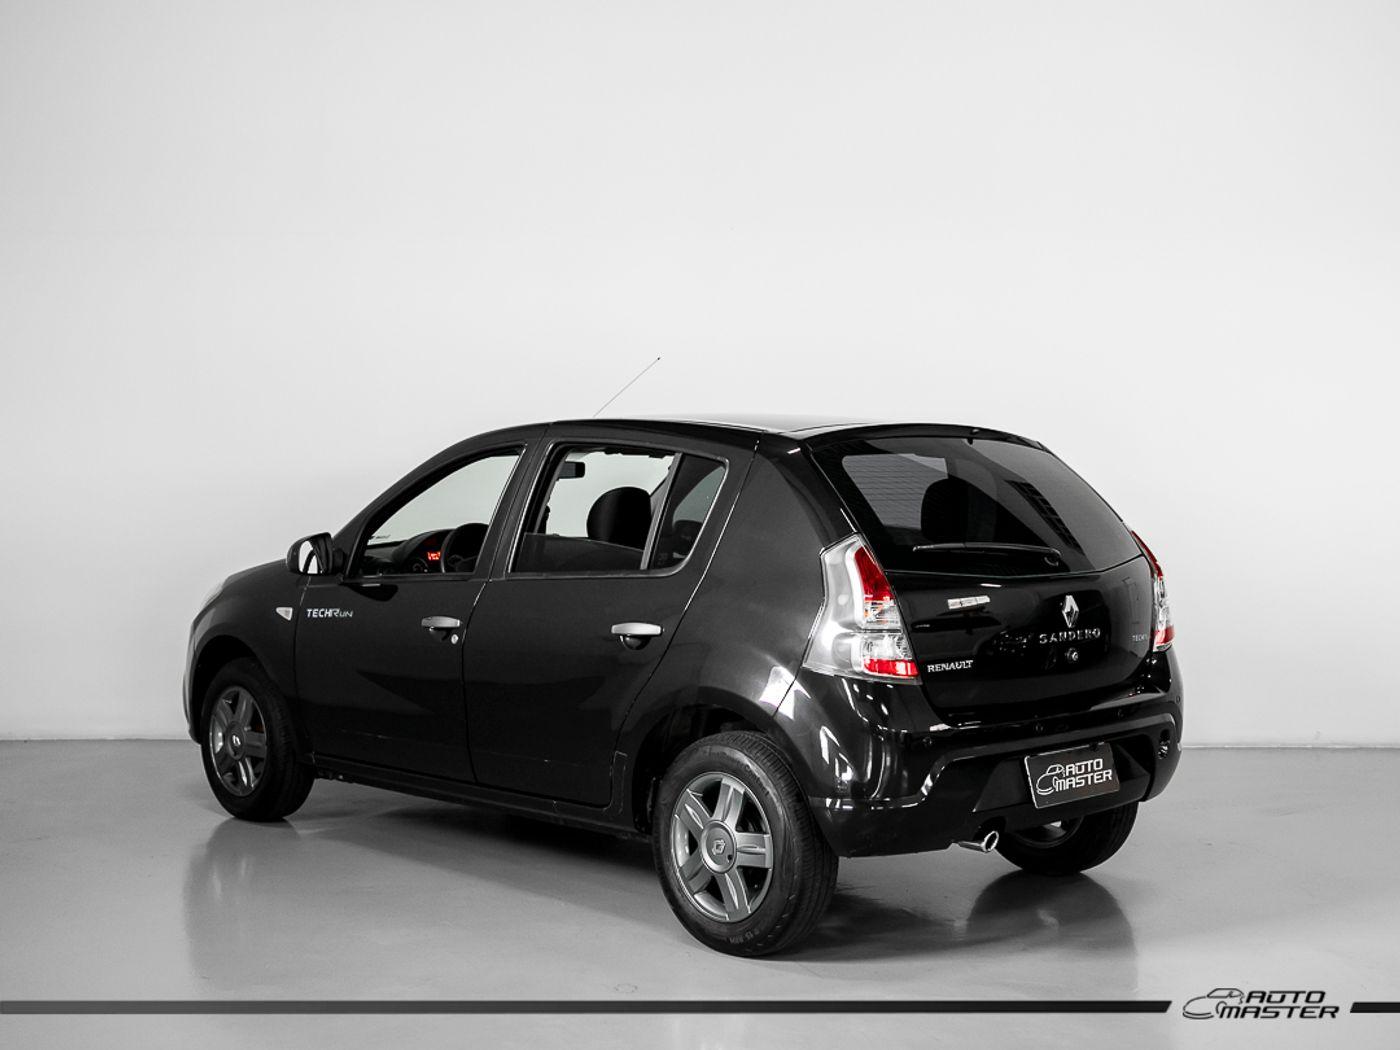 Renault SANDERO TechRun Hi-Flex 1.0 16V 5p